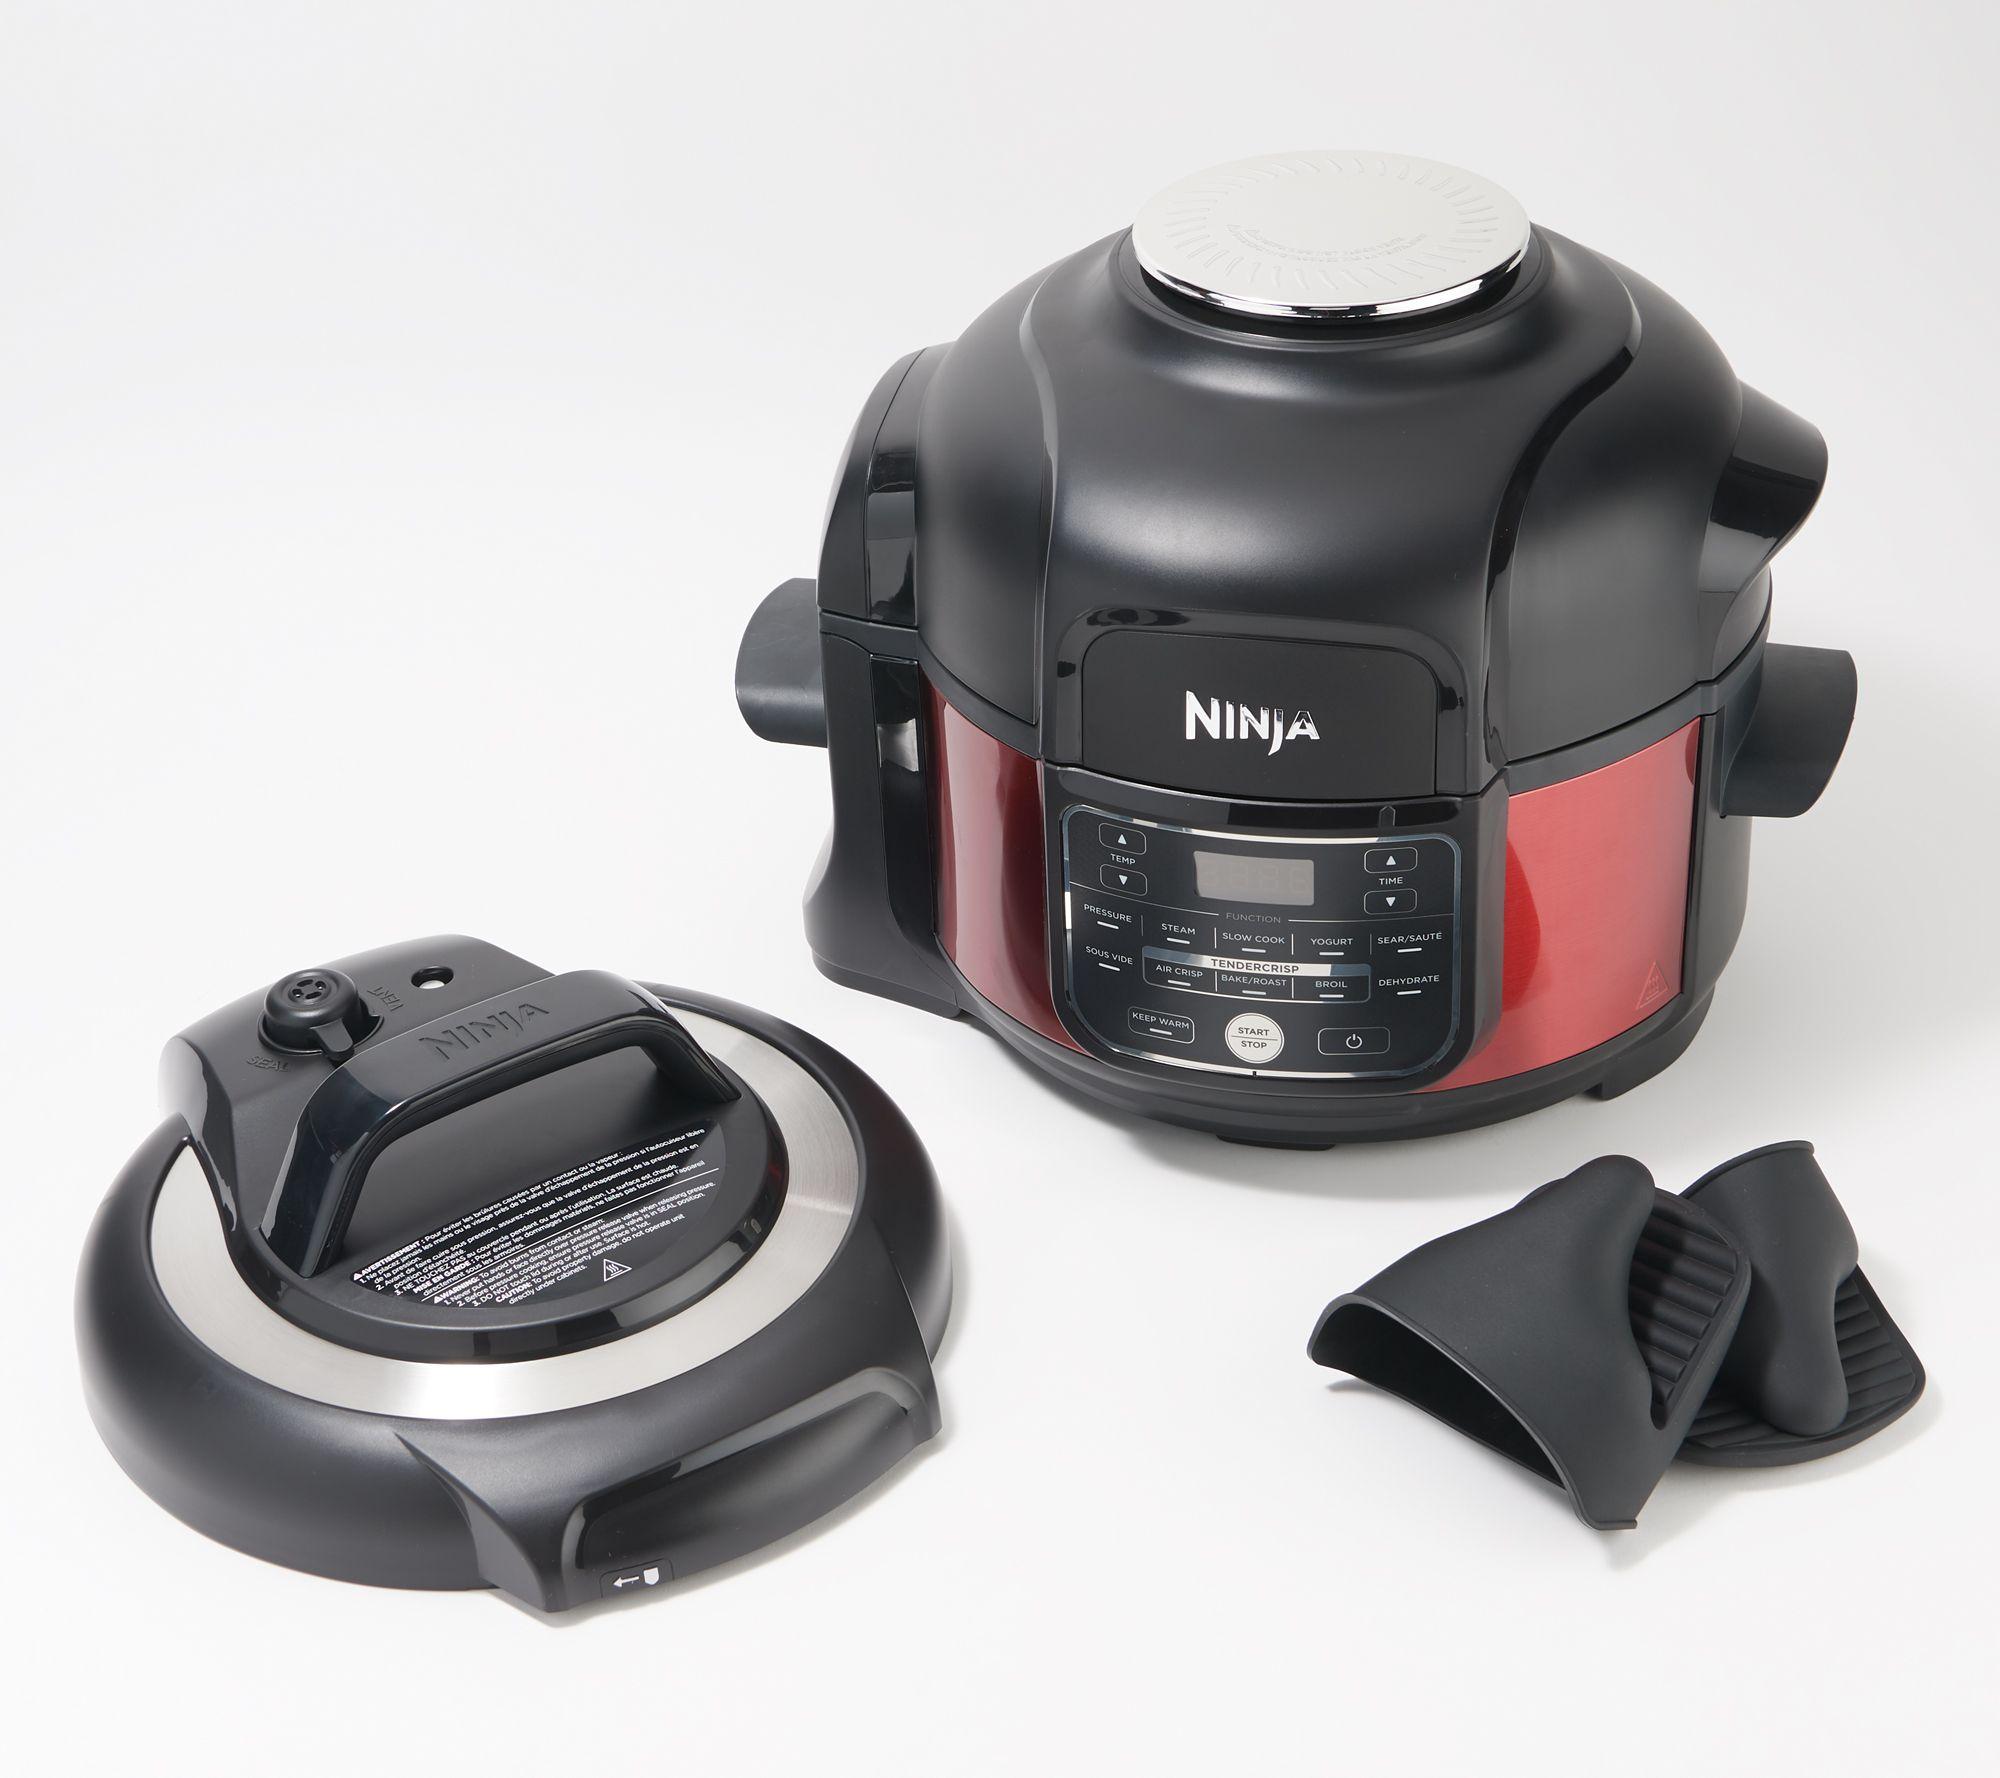 Save $20 on the Ninja Foodi pressure cooker